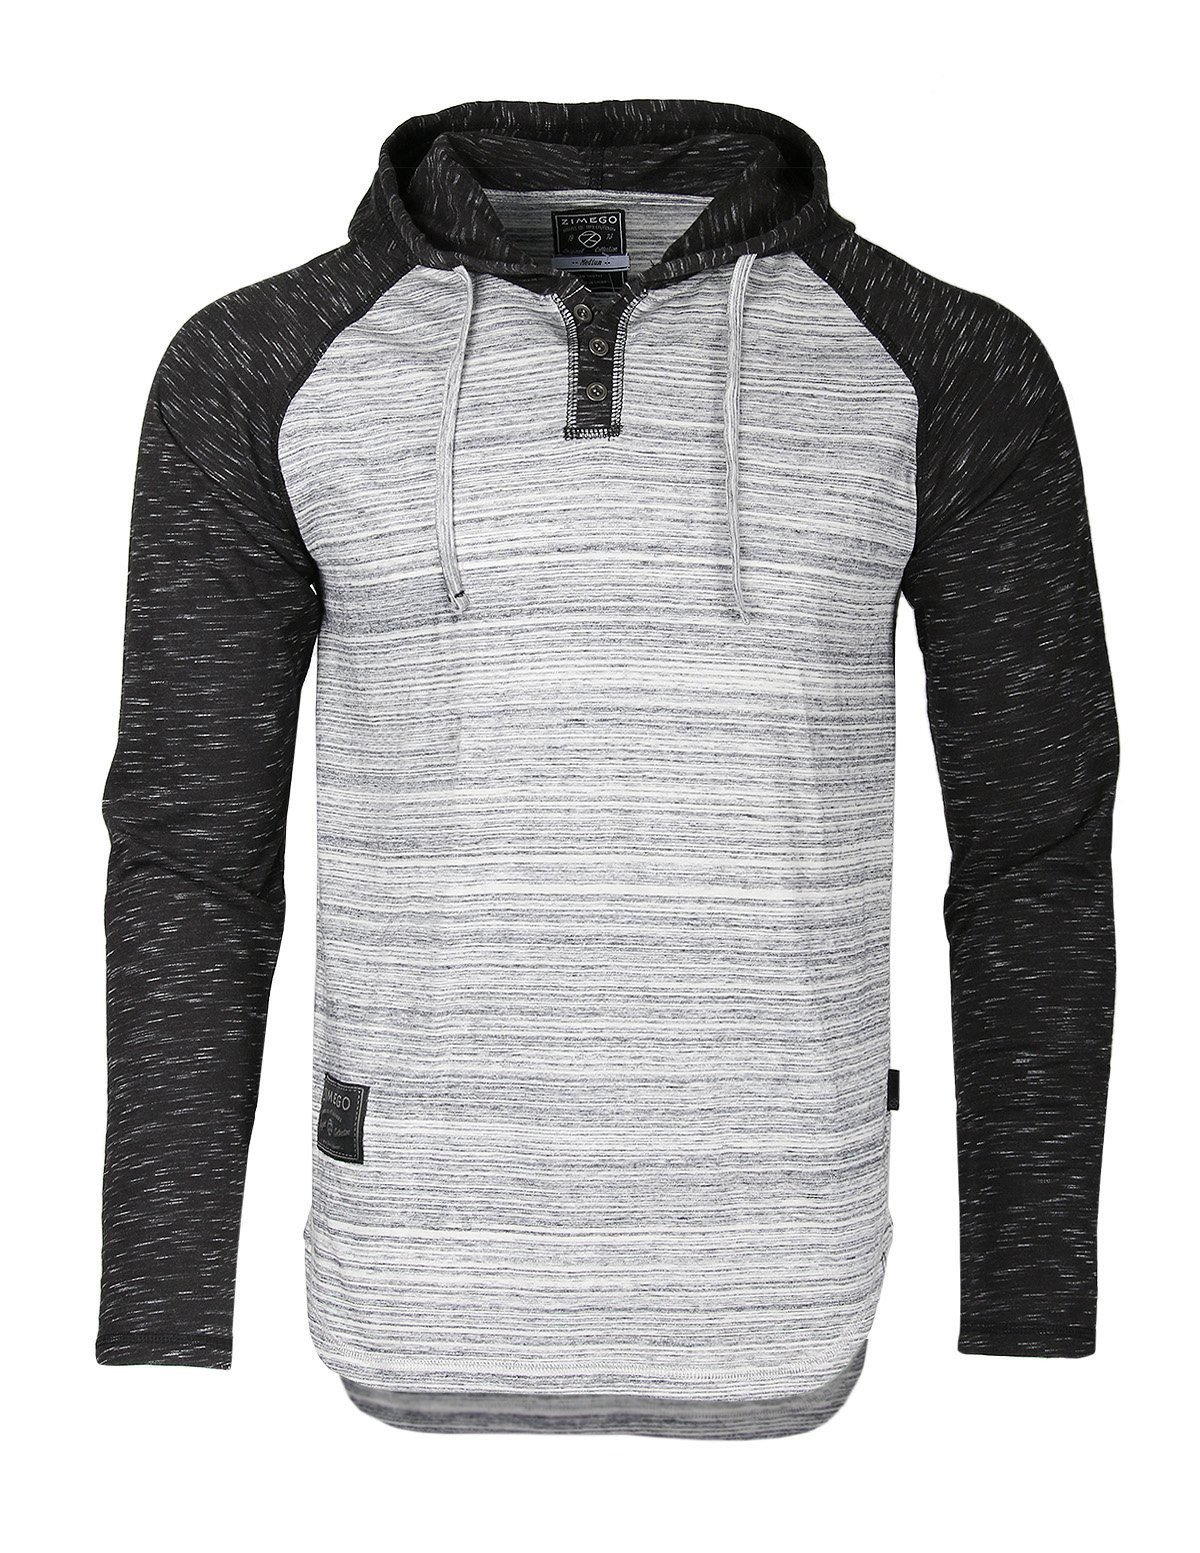 ZIMEGO Long Sleeve Raglan Henley Hoodie Round Bottom Semi Longline T-Shirt (Small, ZFLS140H Hgrey Fulfilled by Amazon)